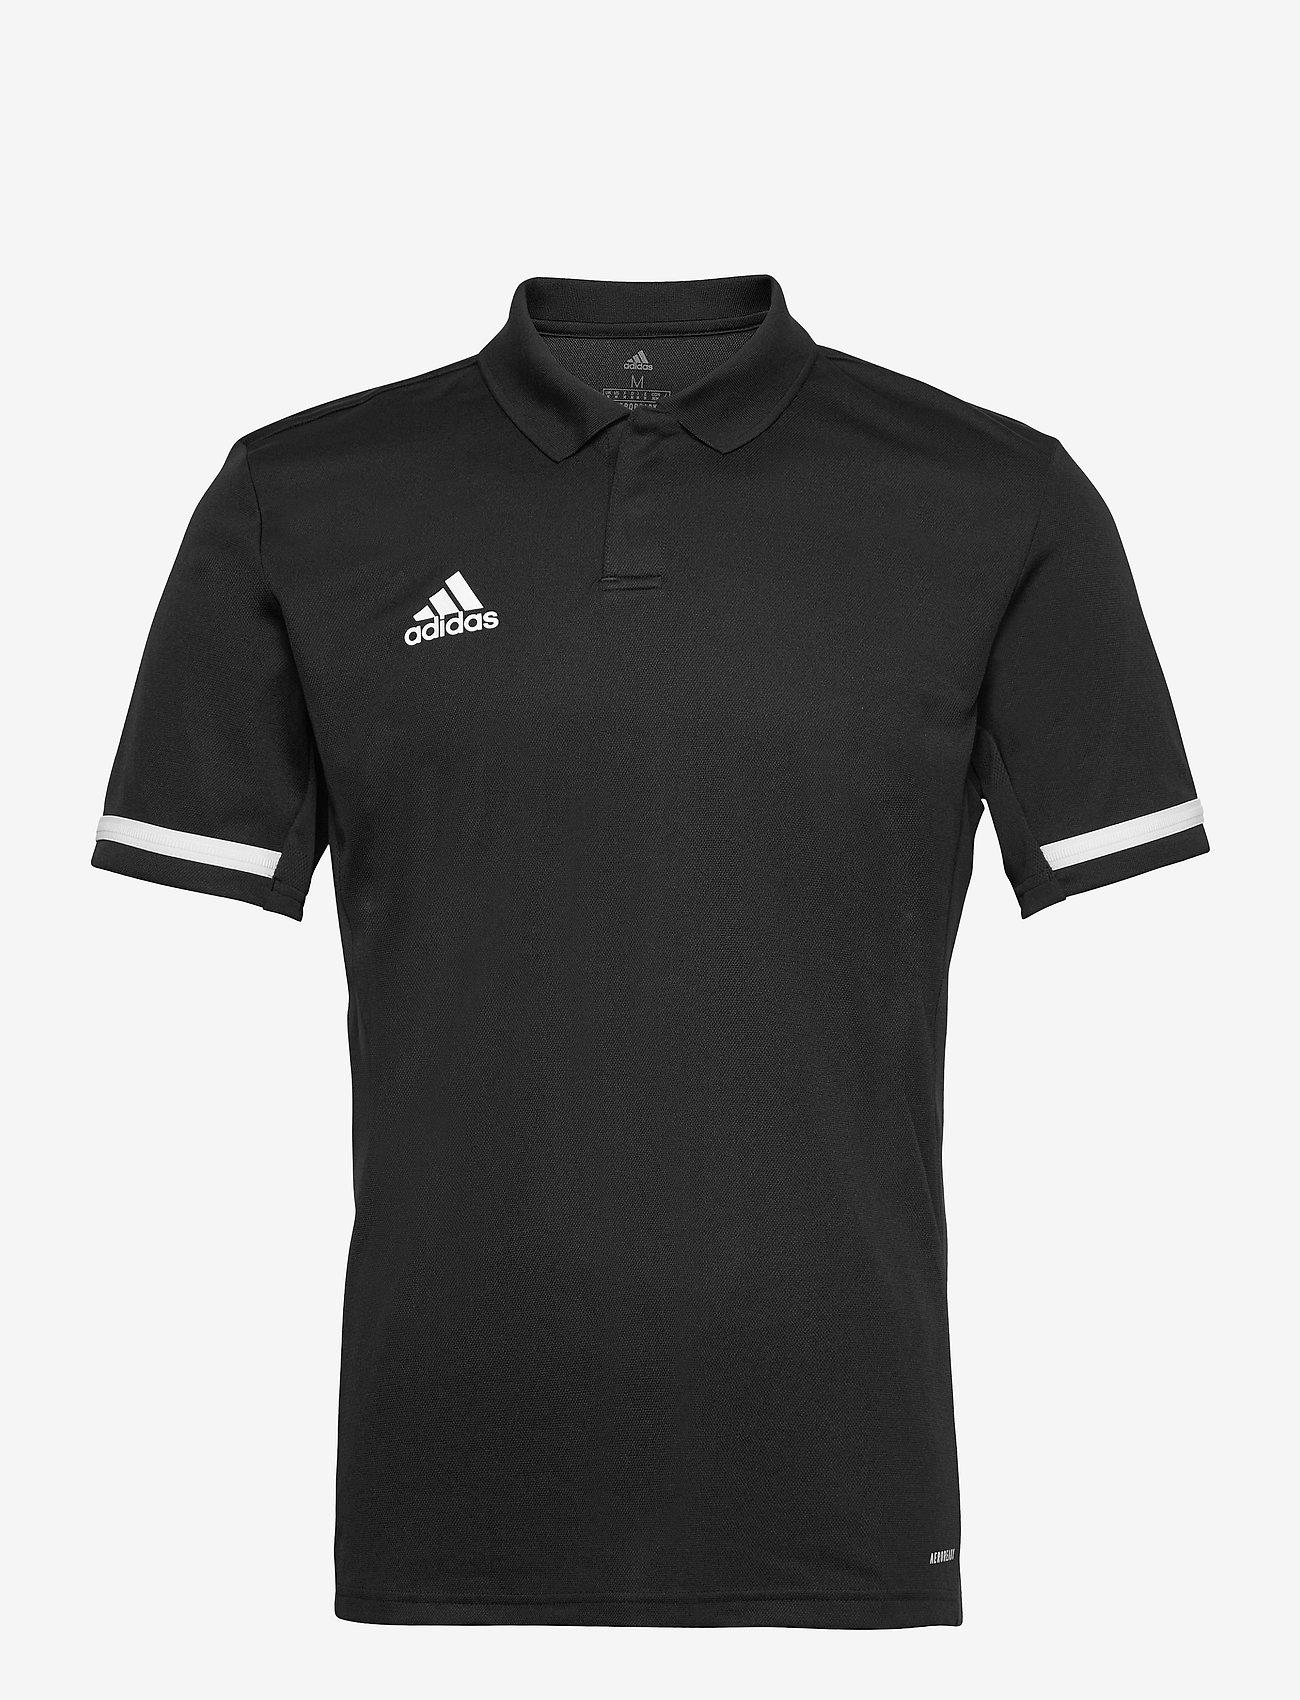 adidas Performance - Team 19 Polo Shirt - kurzärmelig - black/white - 0